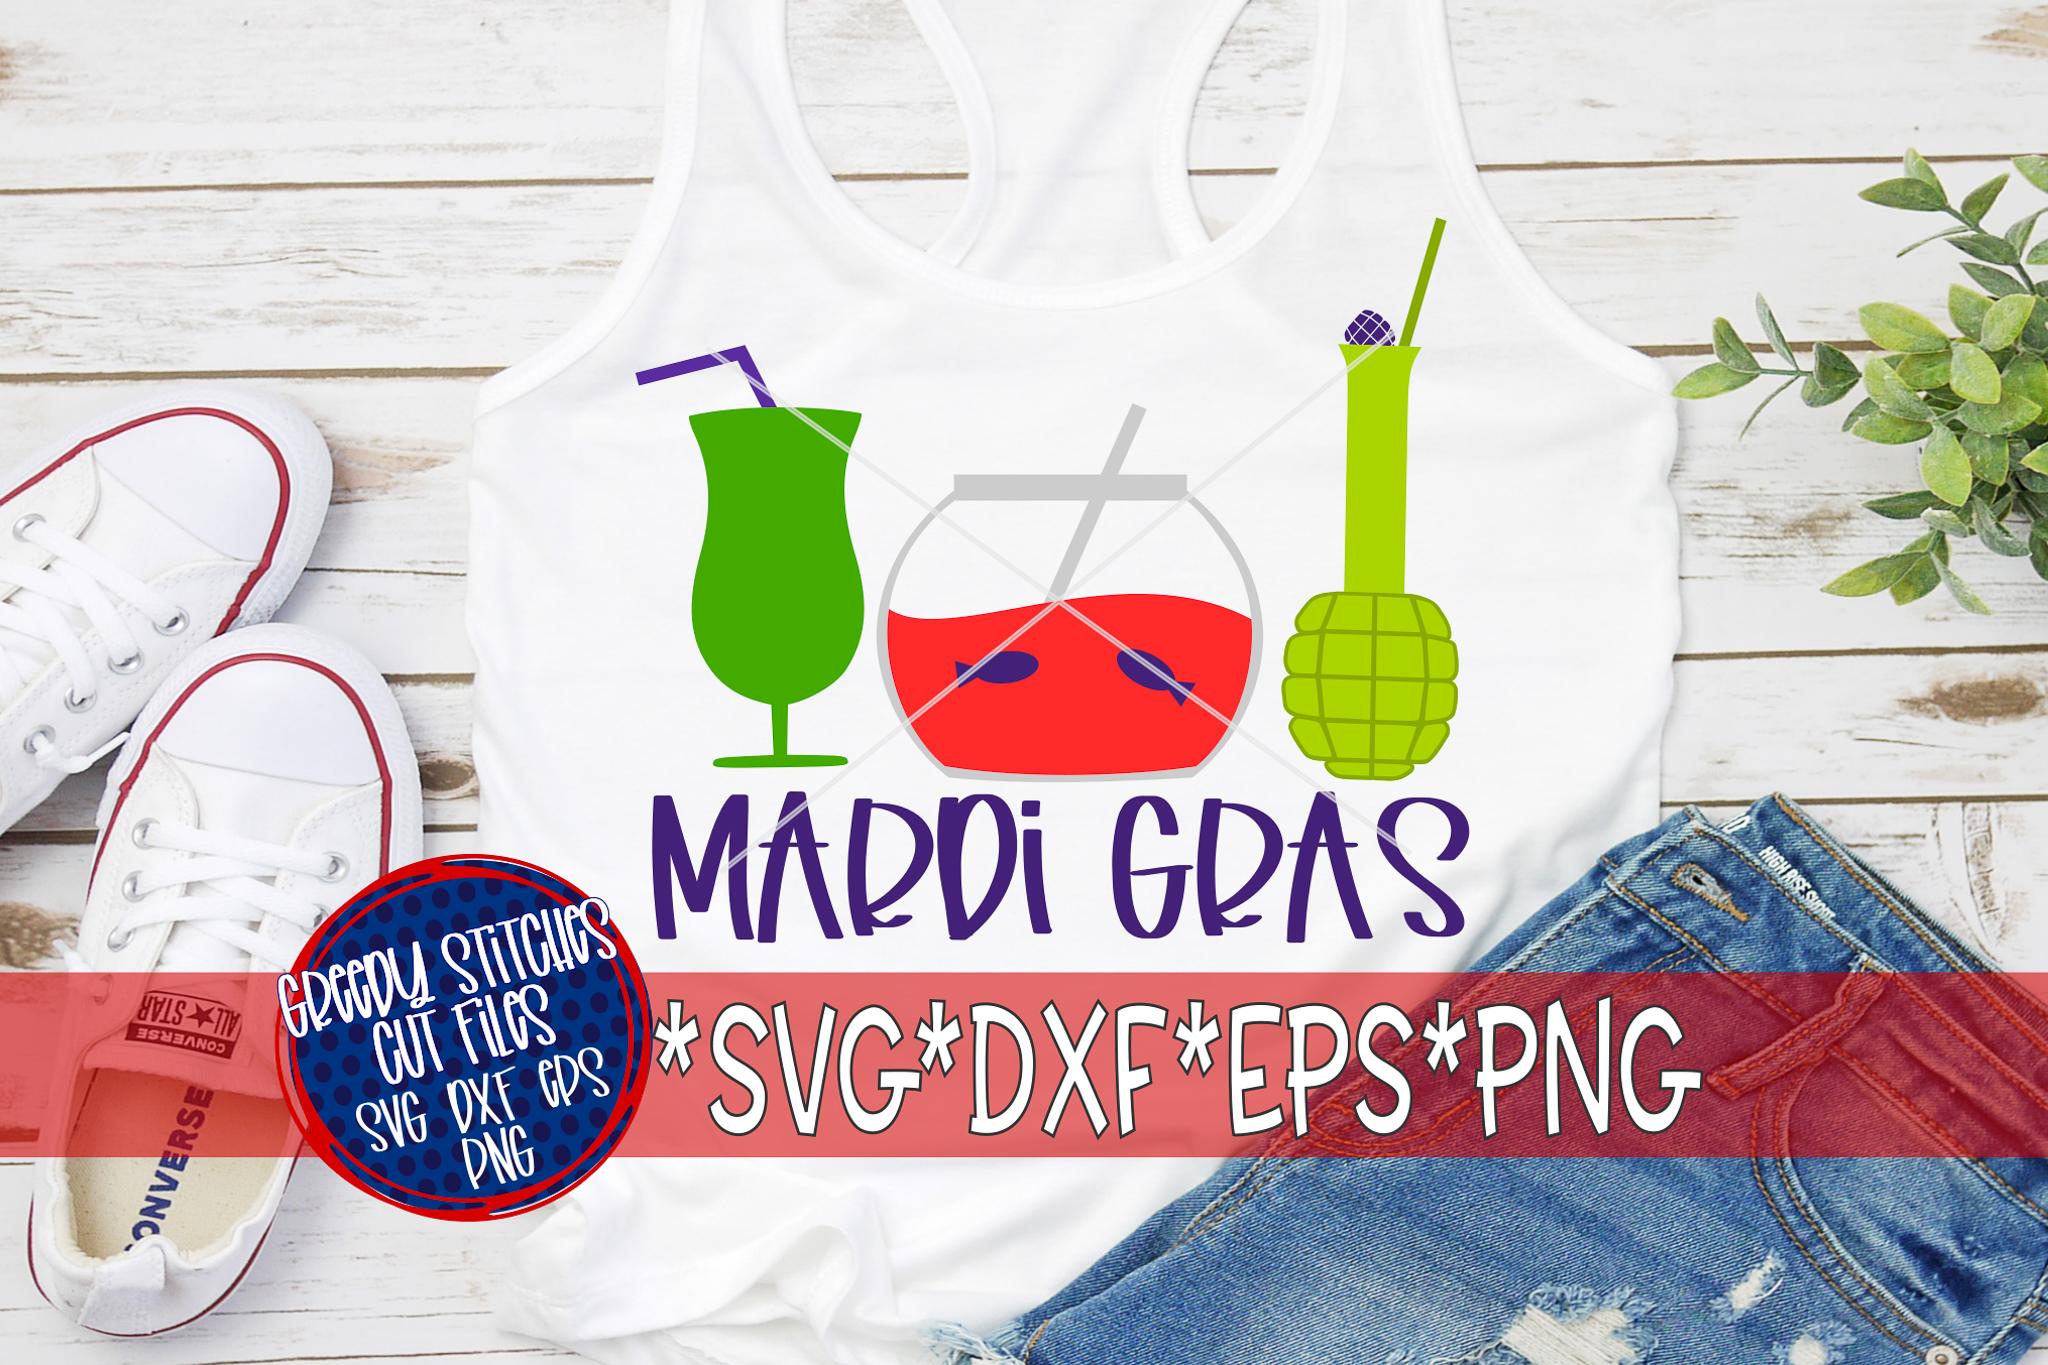 Mardi Gras |Mardi Gras Drinks SVG DXF EPS PNG example image 4